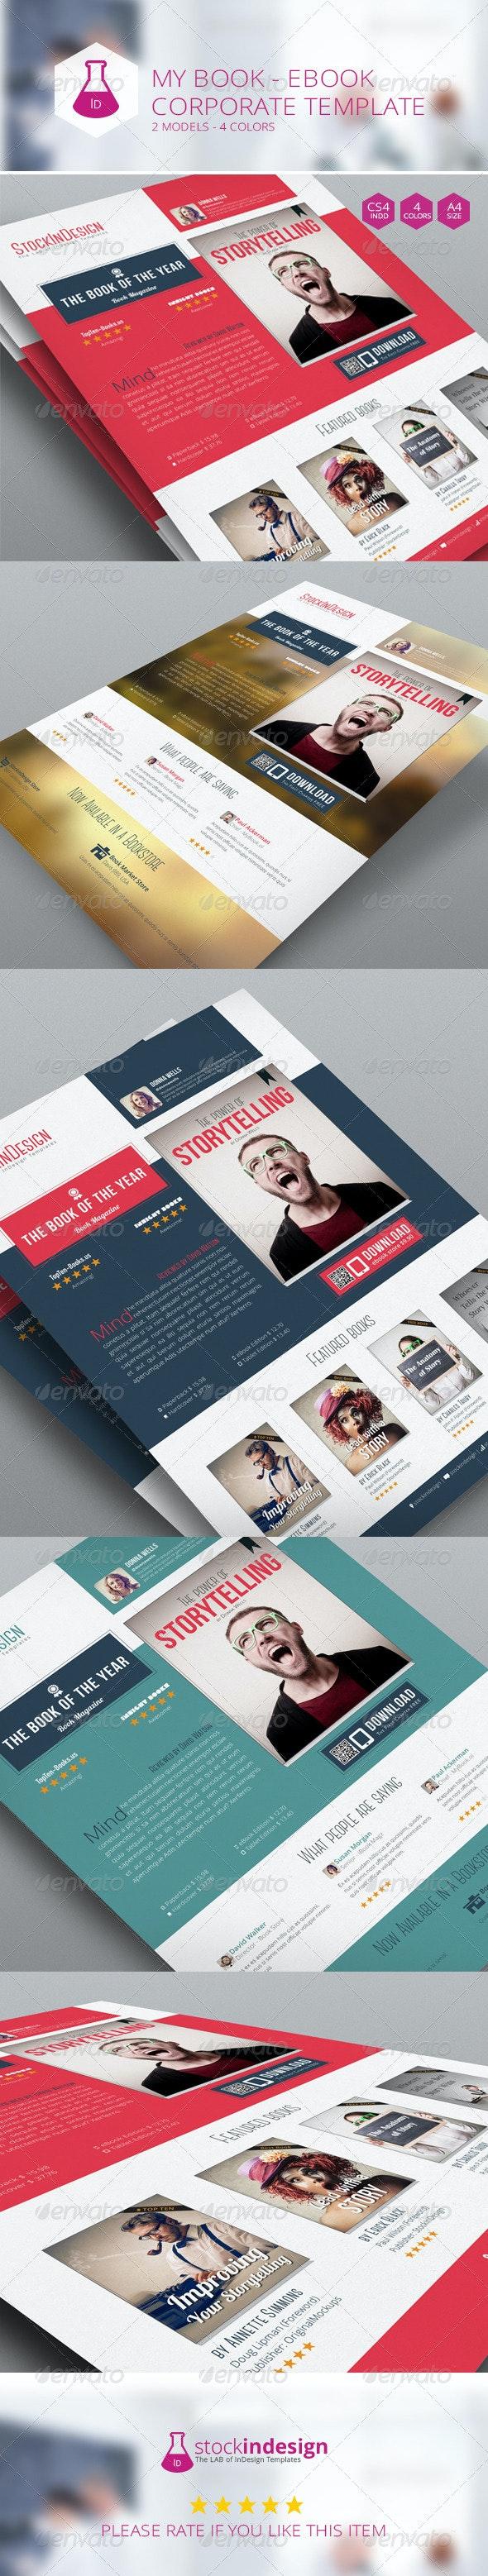 My Book Ebook Promotion - Flat Design - Corporate Flyers